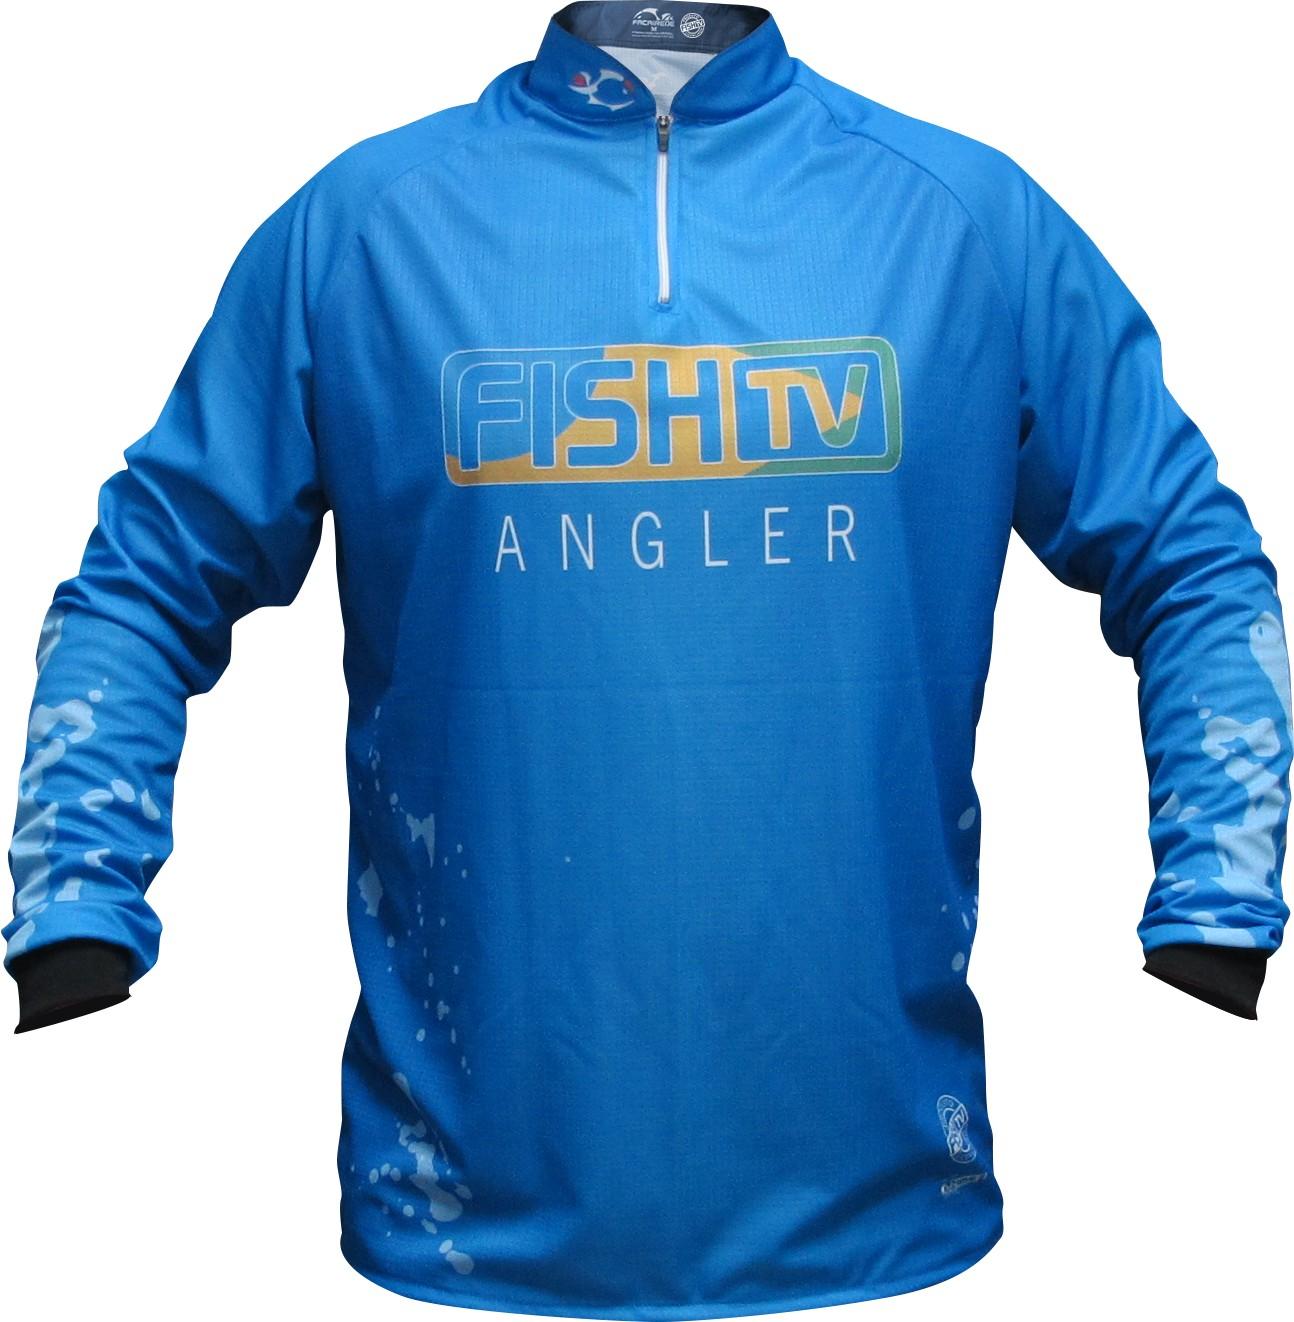 Camiseta Faca na Rede Fish TV Angler Jersey LC 02